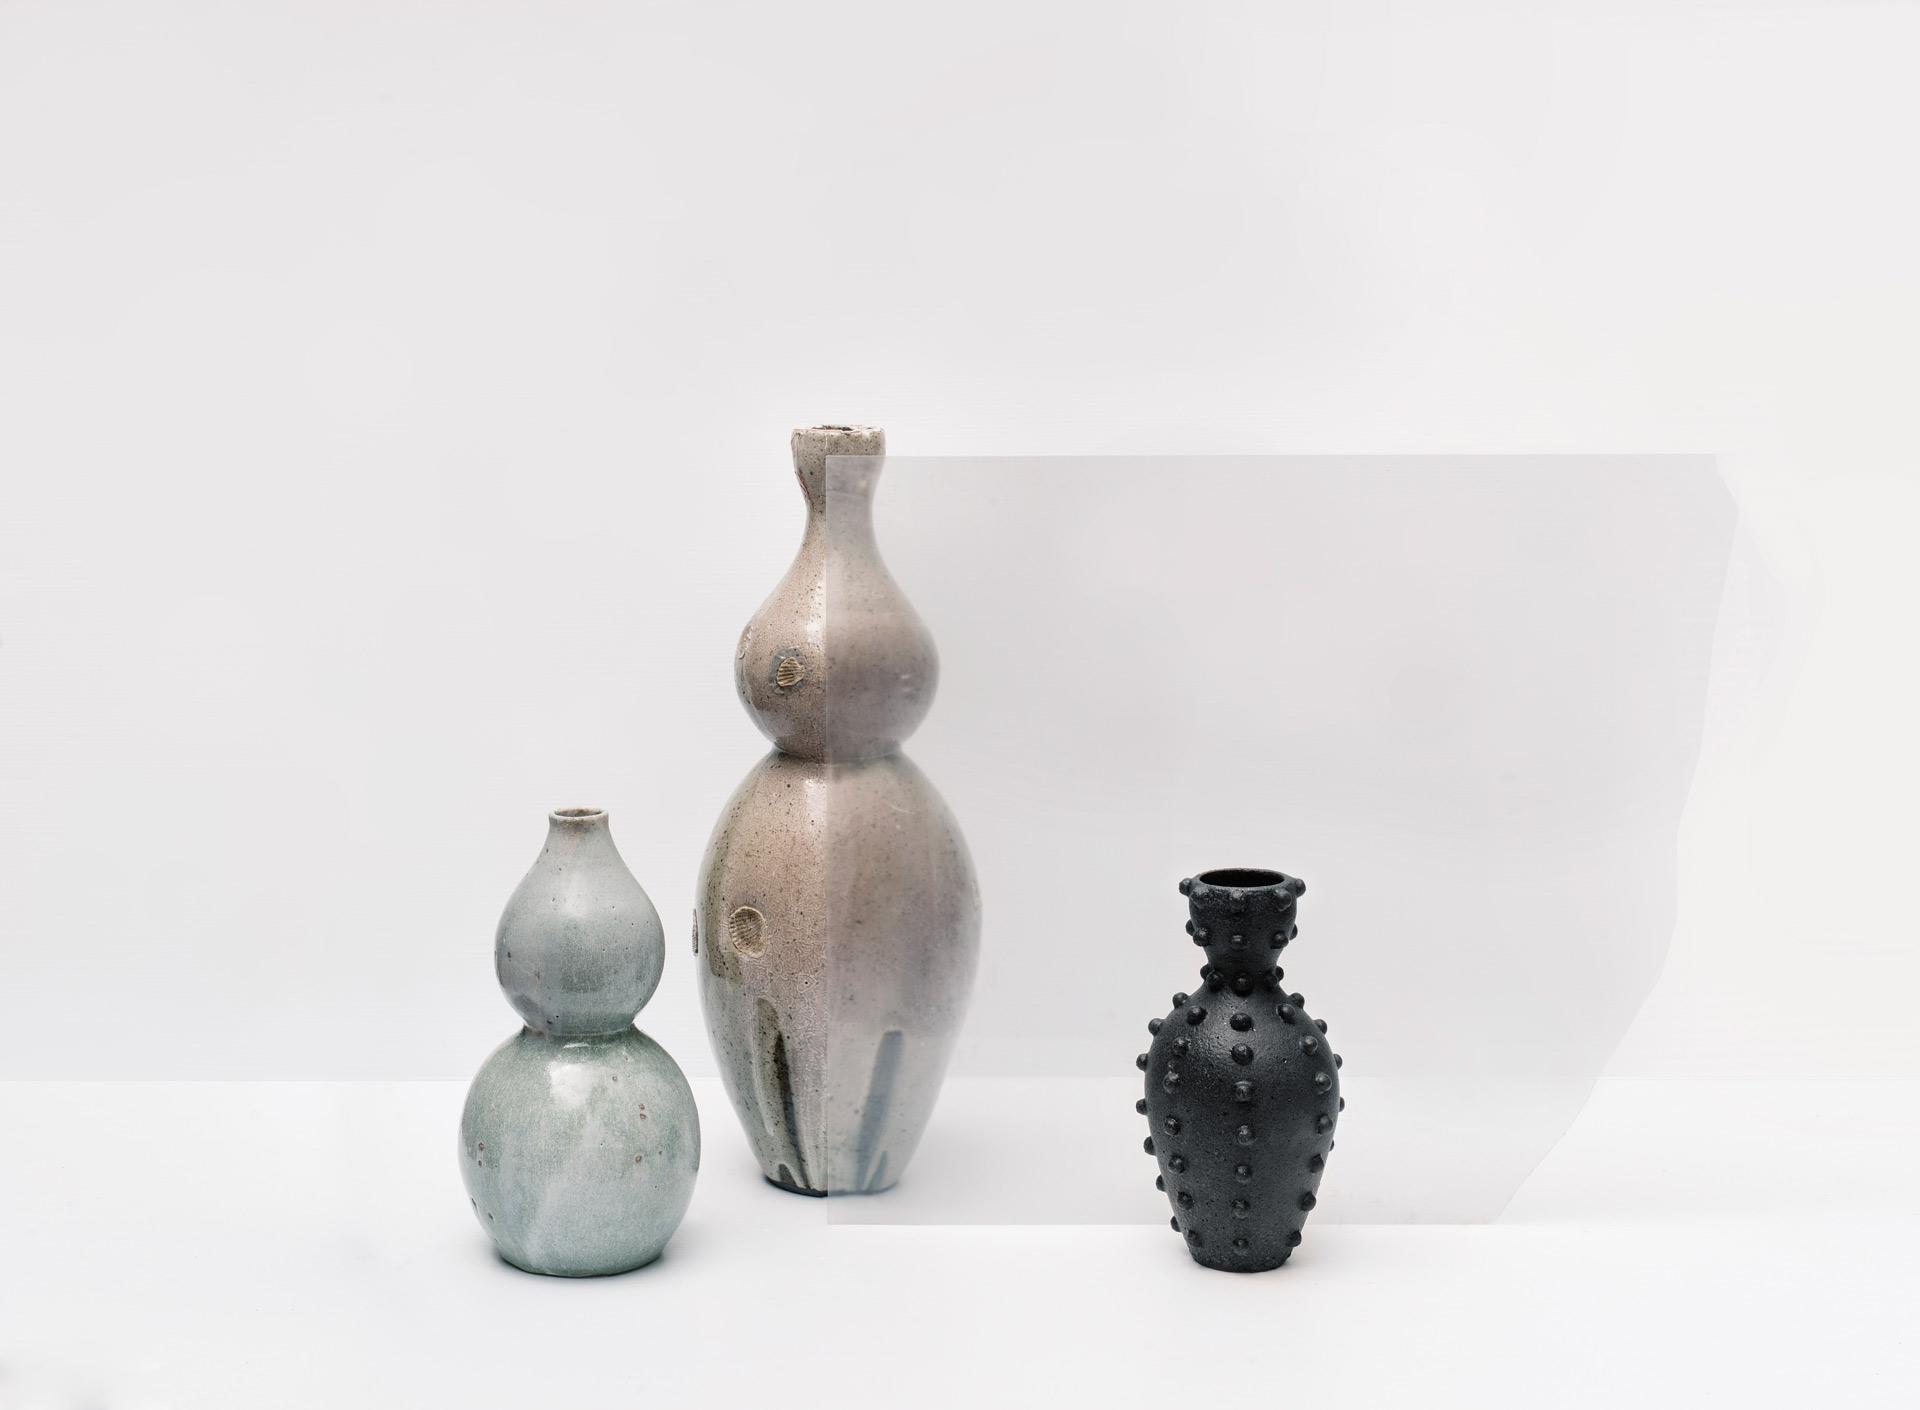 Gourd Vessel, Woodfired Reef Vase, Studded Vase, 2017